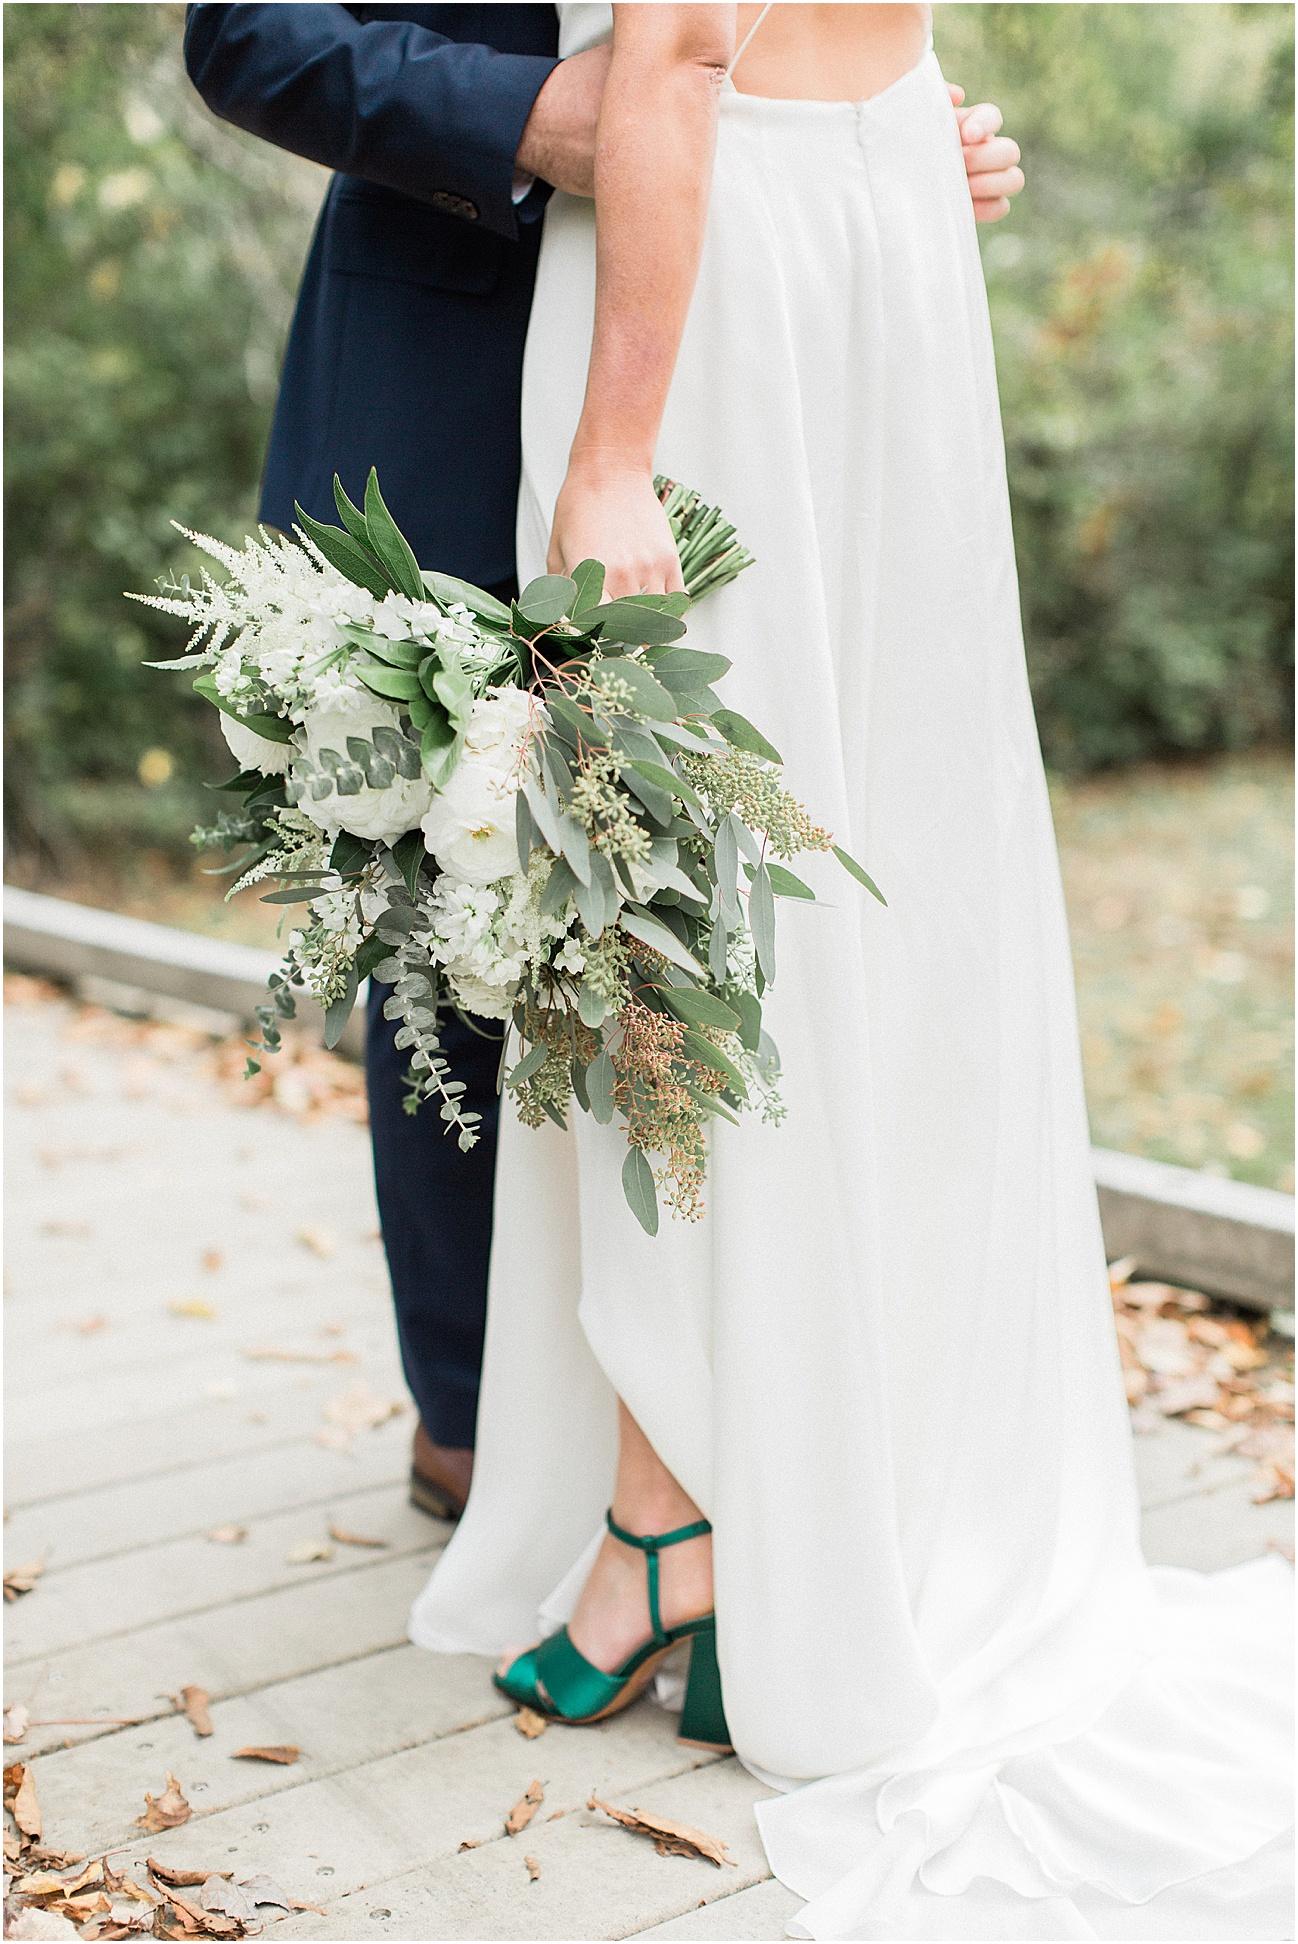 jenna_mike_willowdale_estate_topsfield_neutral_whites_greens_fall_cape_cod_boston_wedding_photographer_meredith_jane_photography_photo_1428.jpg